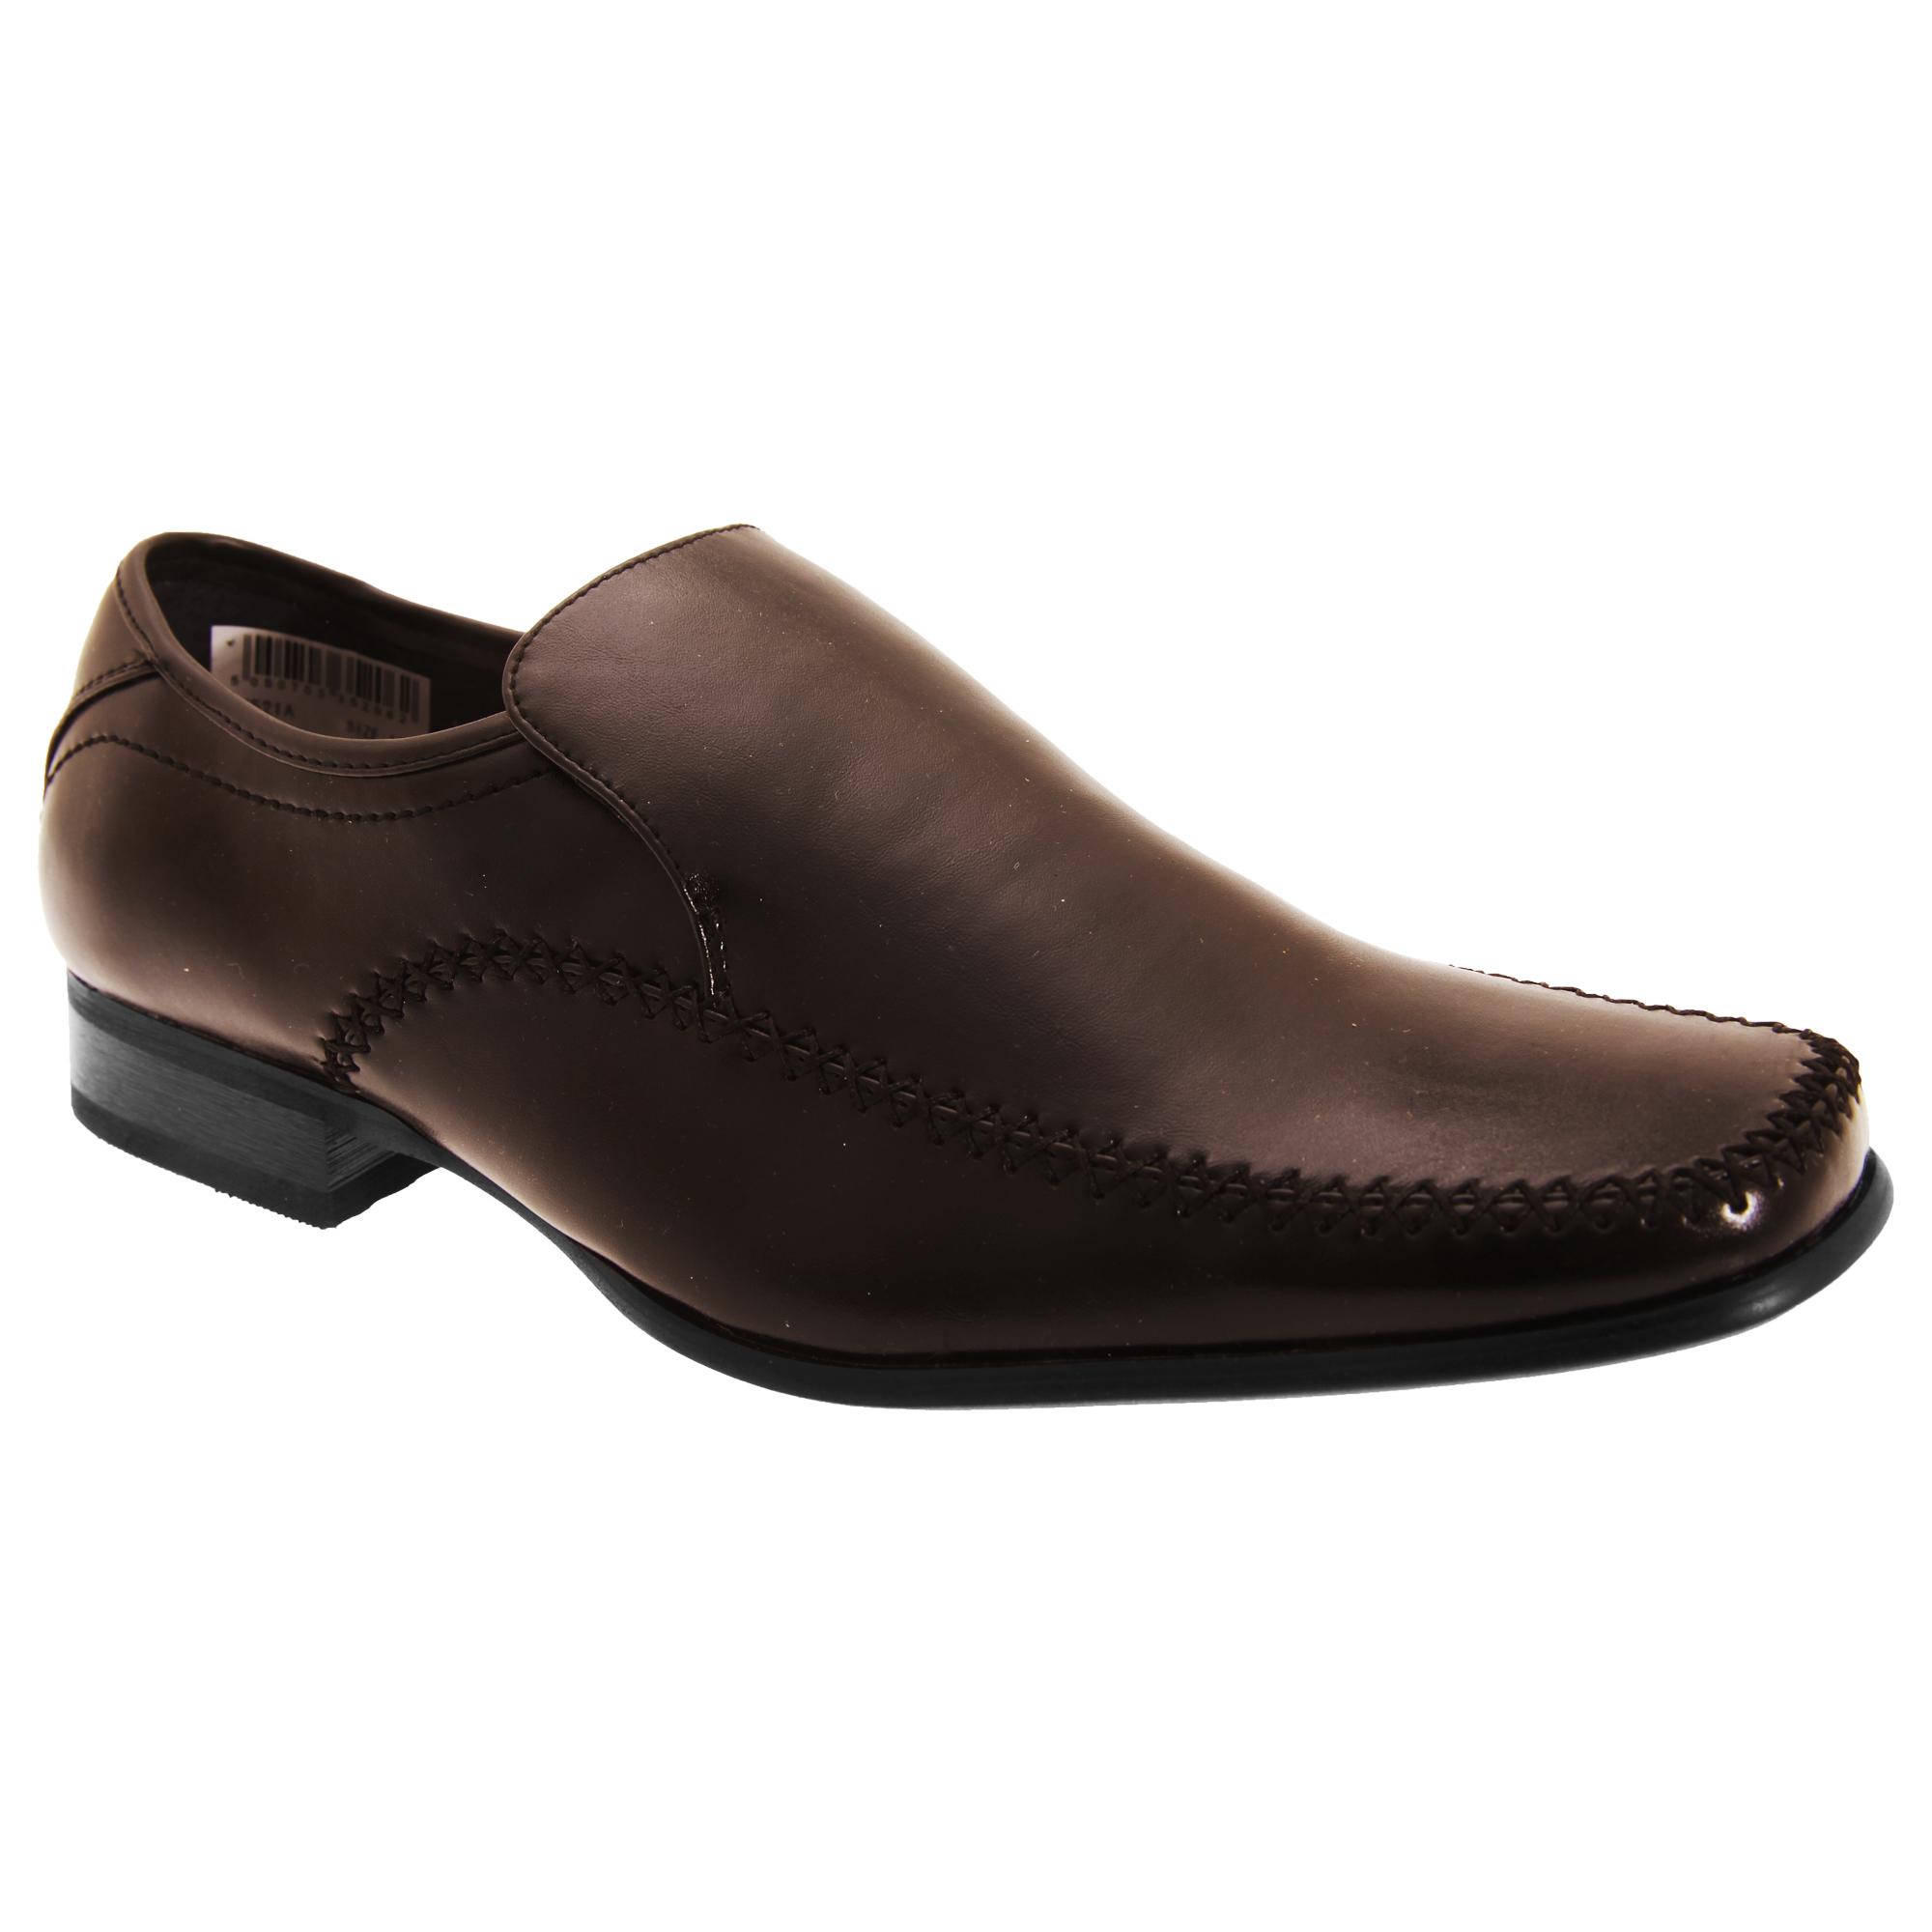 goor herren loafer slipper schuhe leder ebay. Black Bedroom Furniture Sets. Home Design Ideas